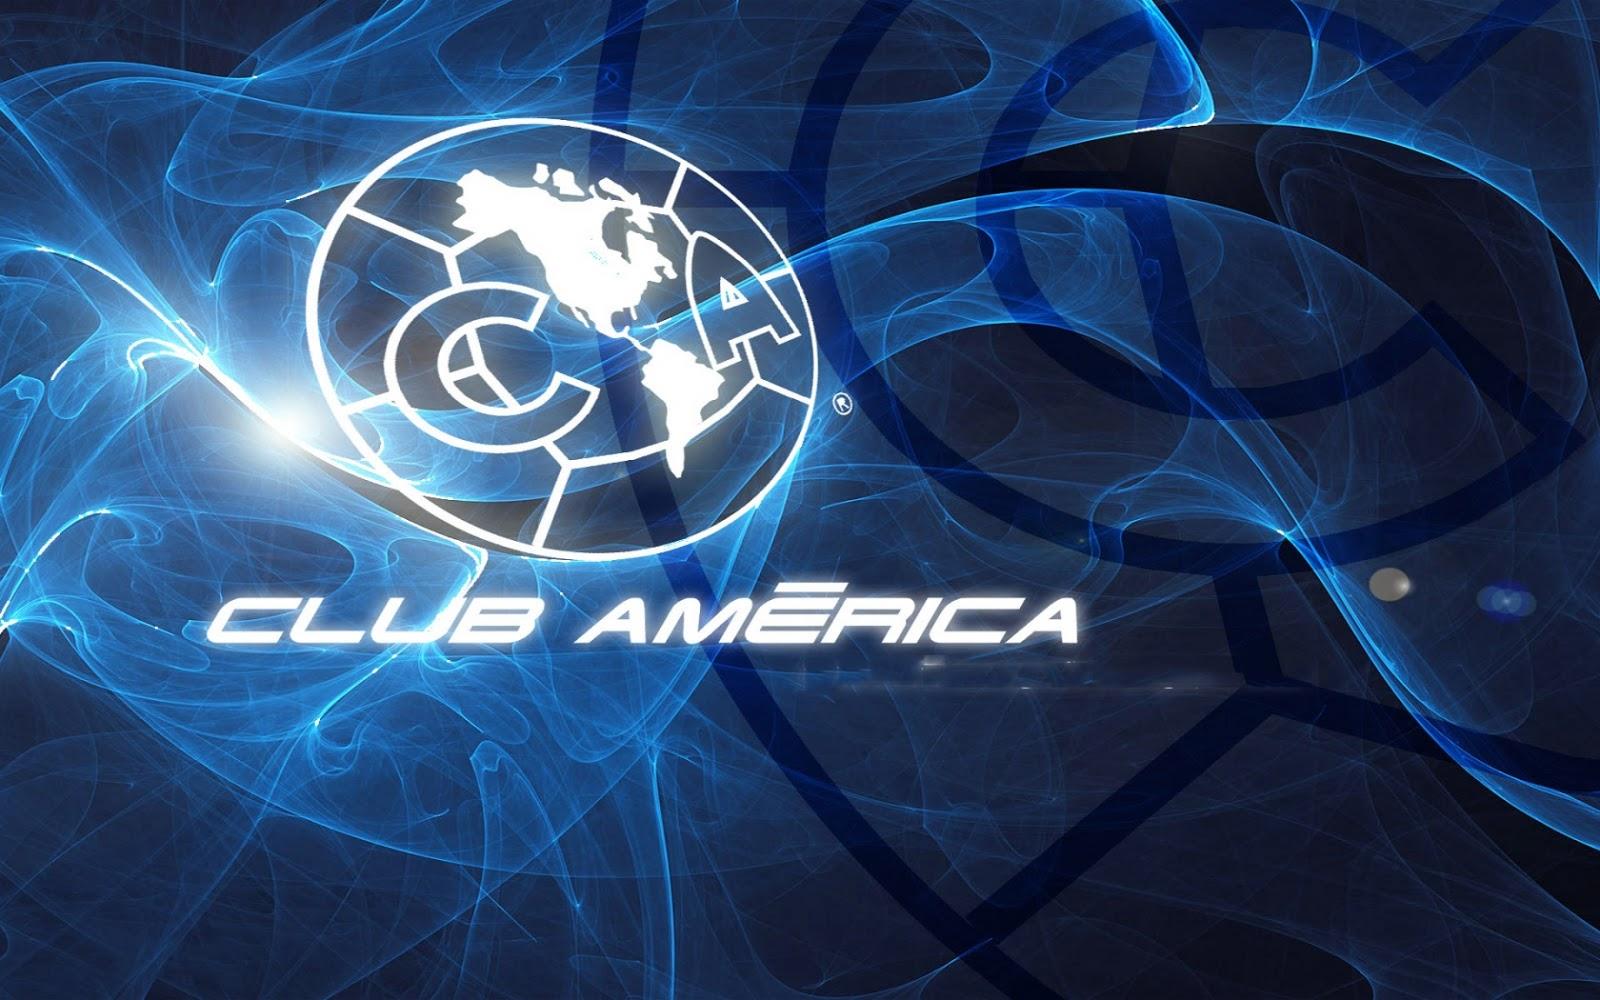 Aguilas Del America Wallpapers 10